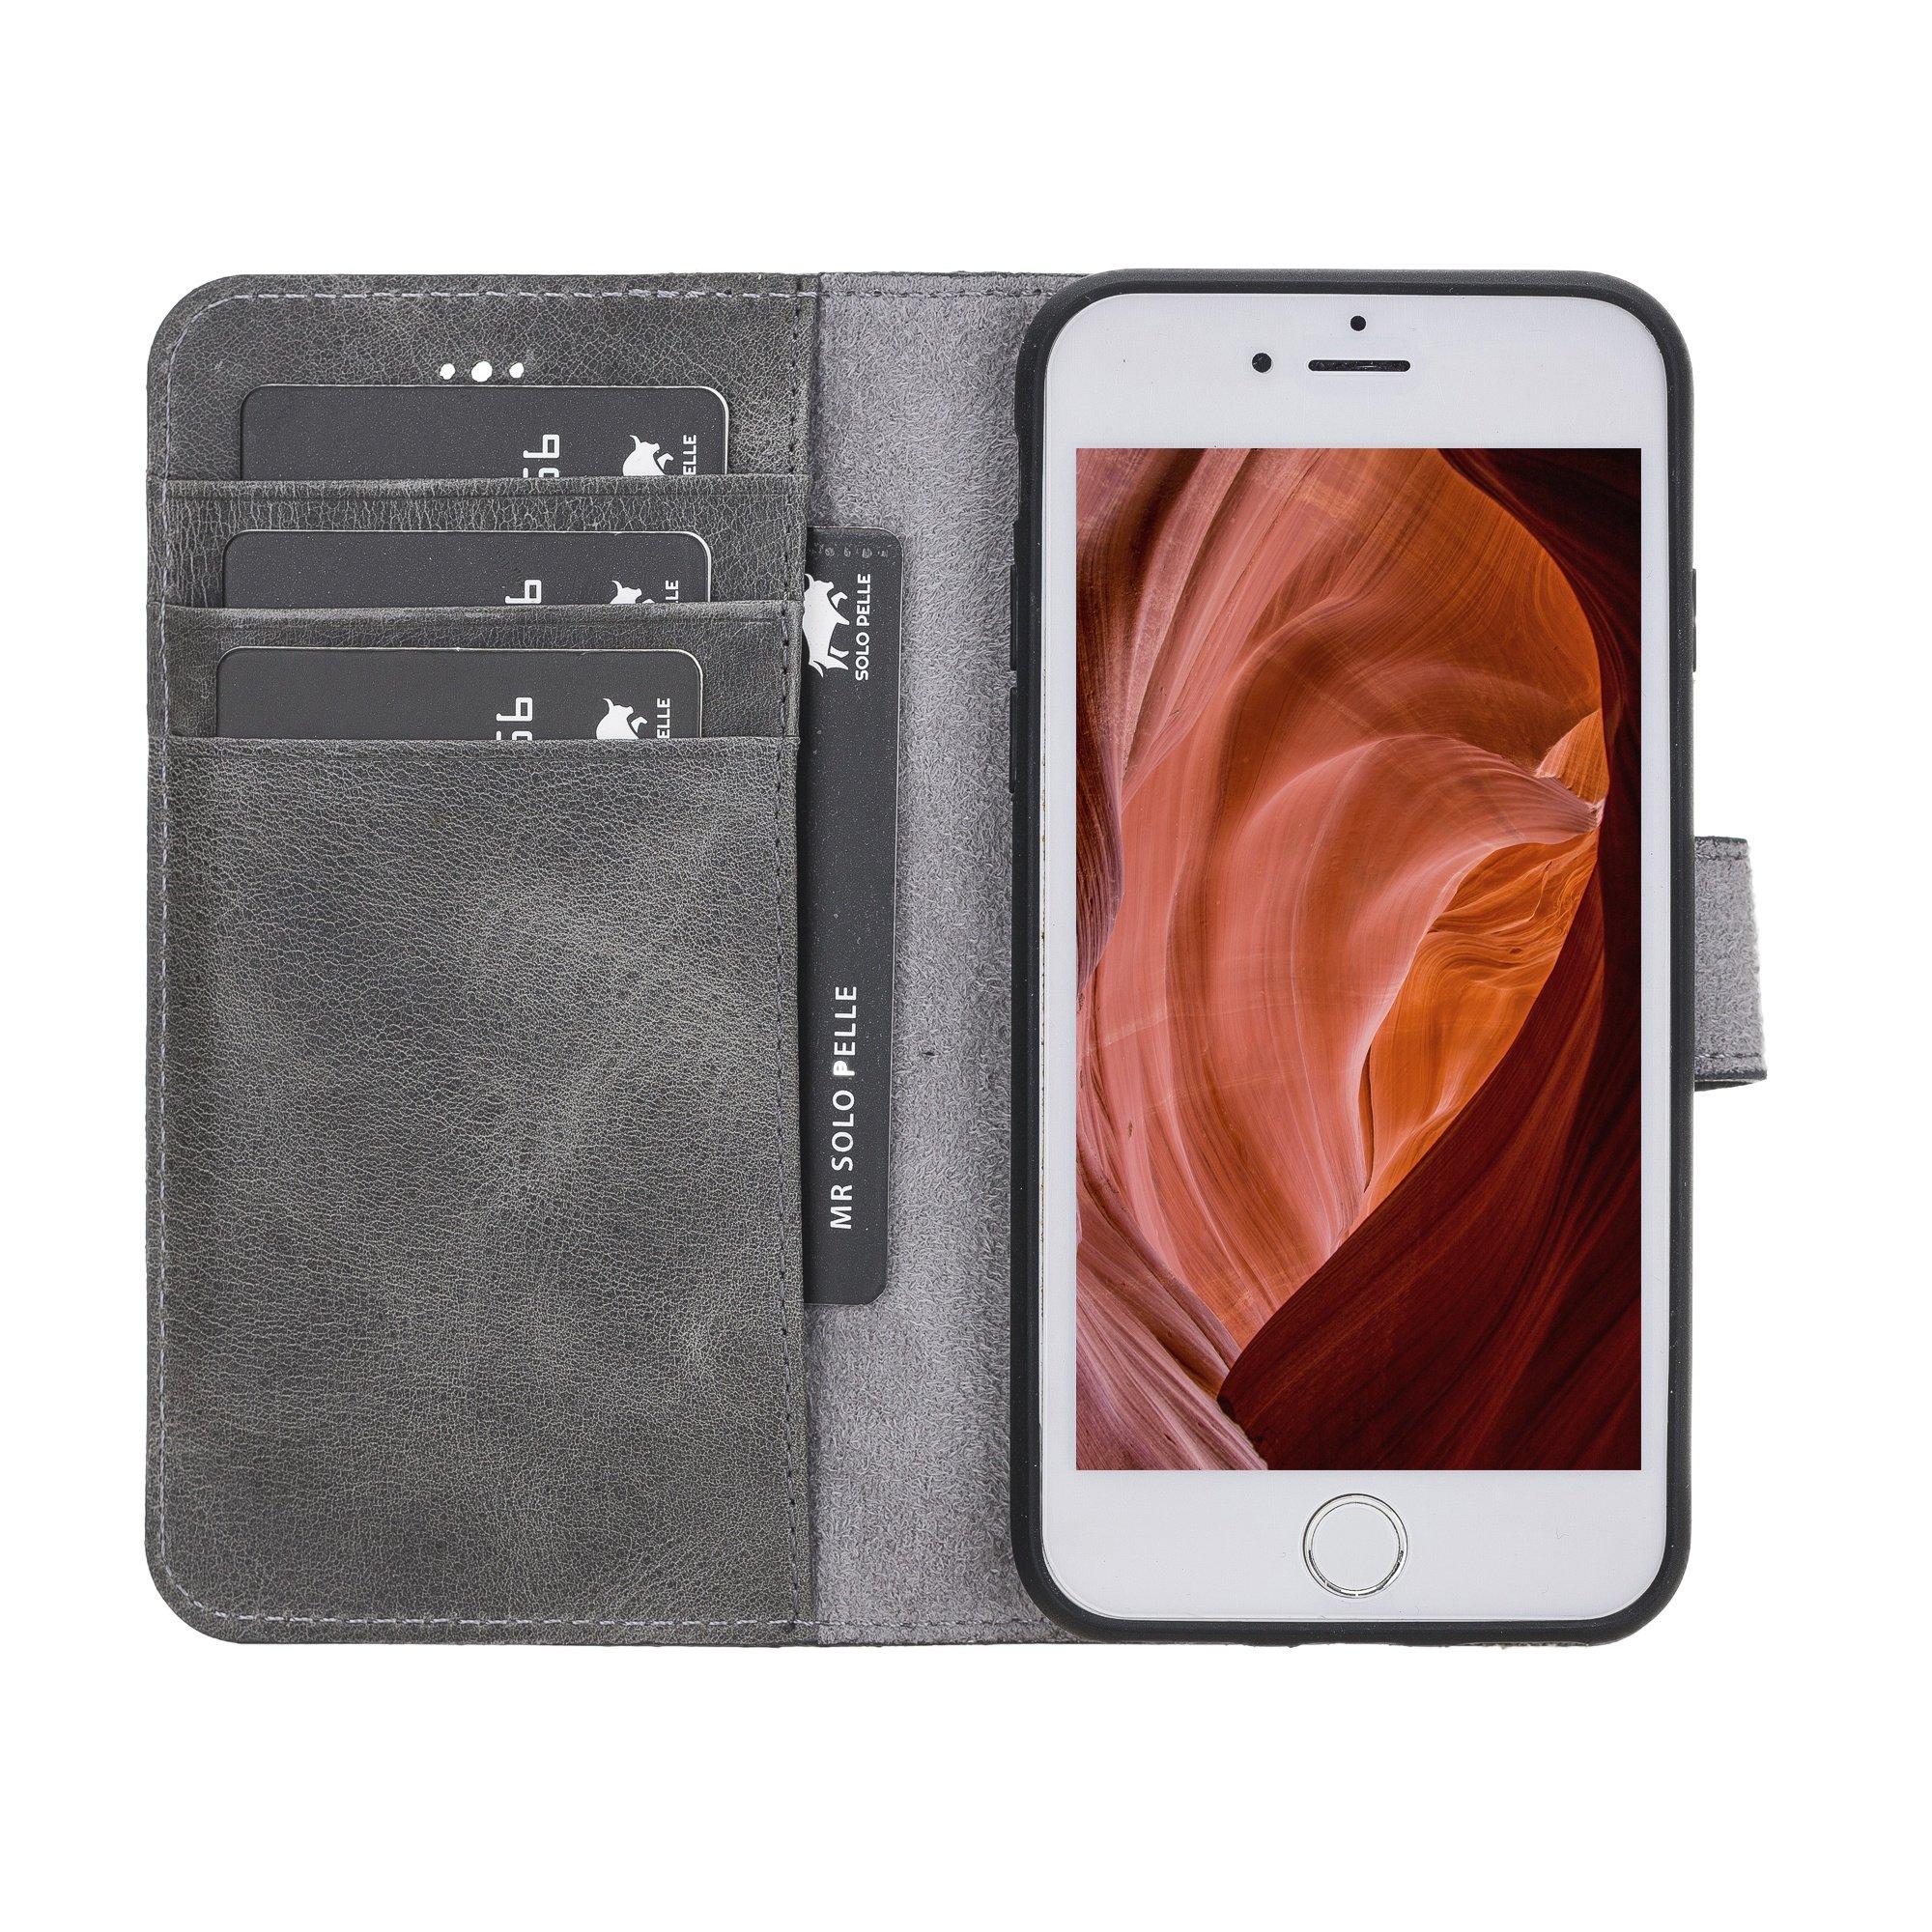 Solo Pelle iPhone SE 2020 / 7 / 8 abnehmbare Lederhülle (2in1) inkl. Kartenfächer für das original iPhone 7/8 (Steingrau)